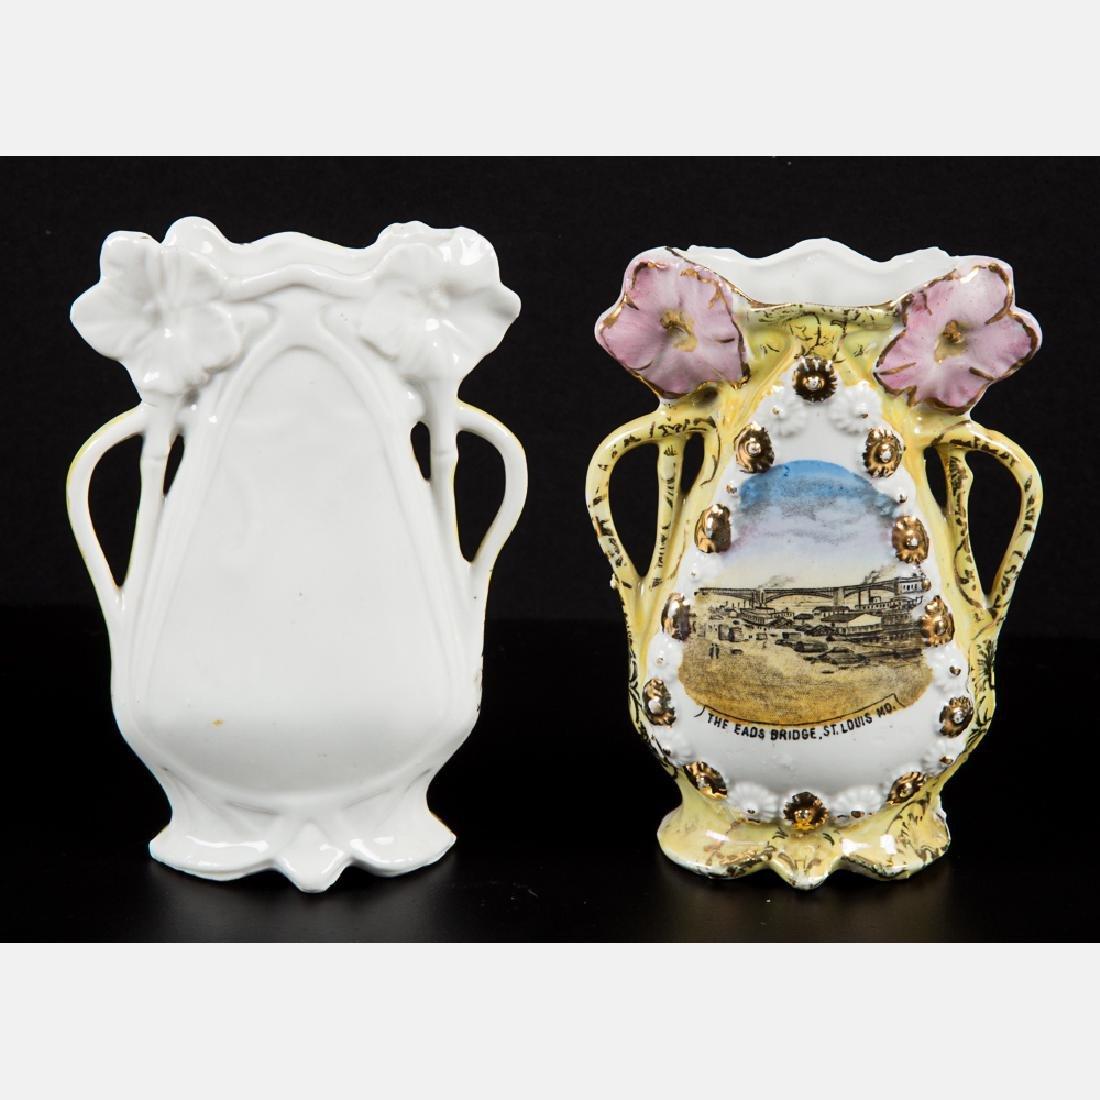 A Group of Five Porcelain Lustreware Decorative Items - 4